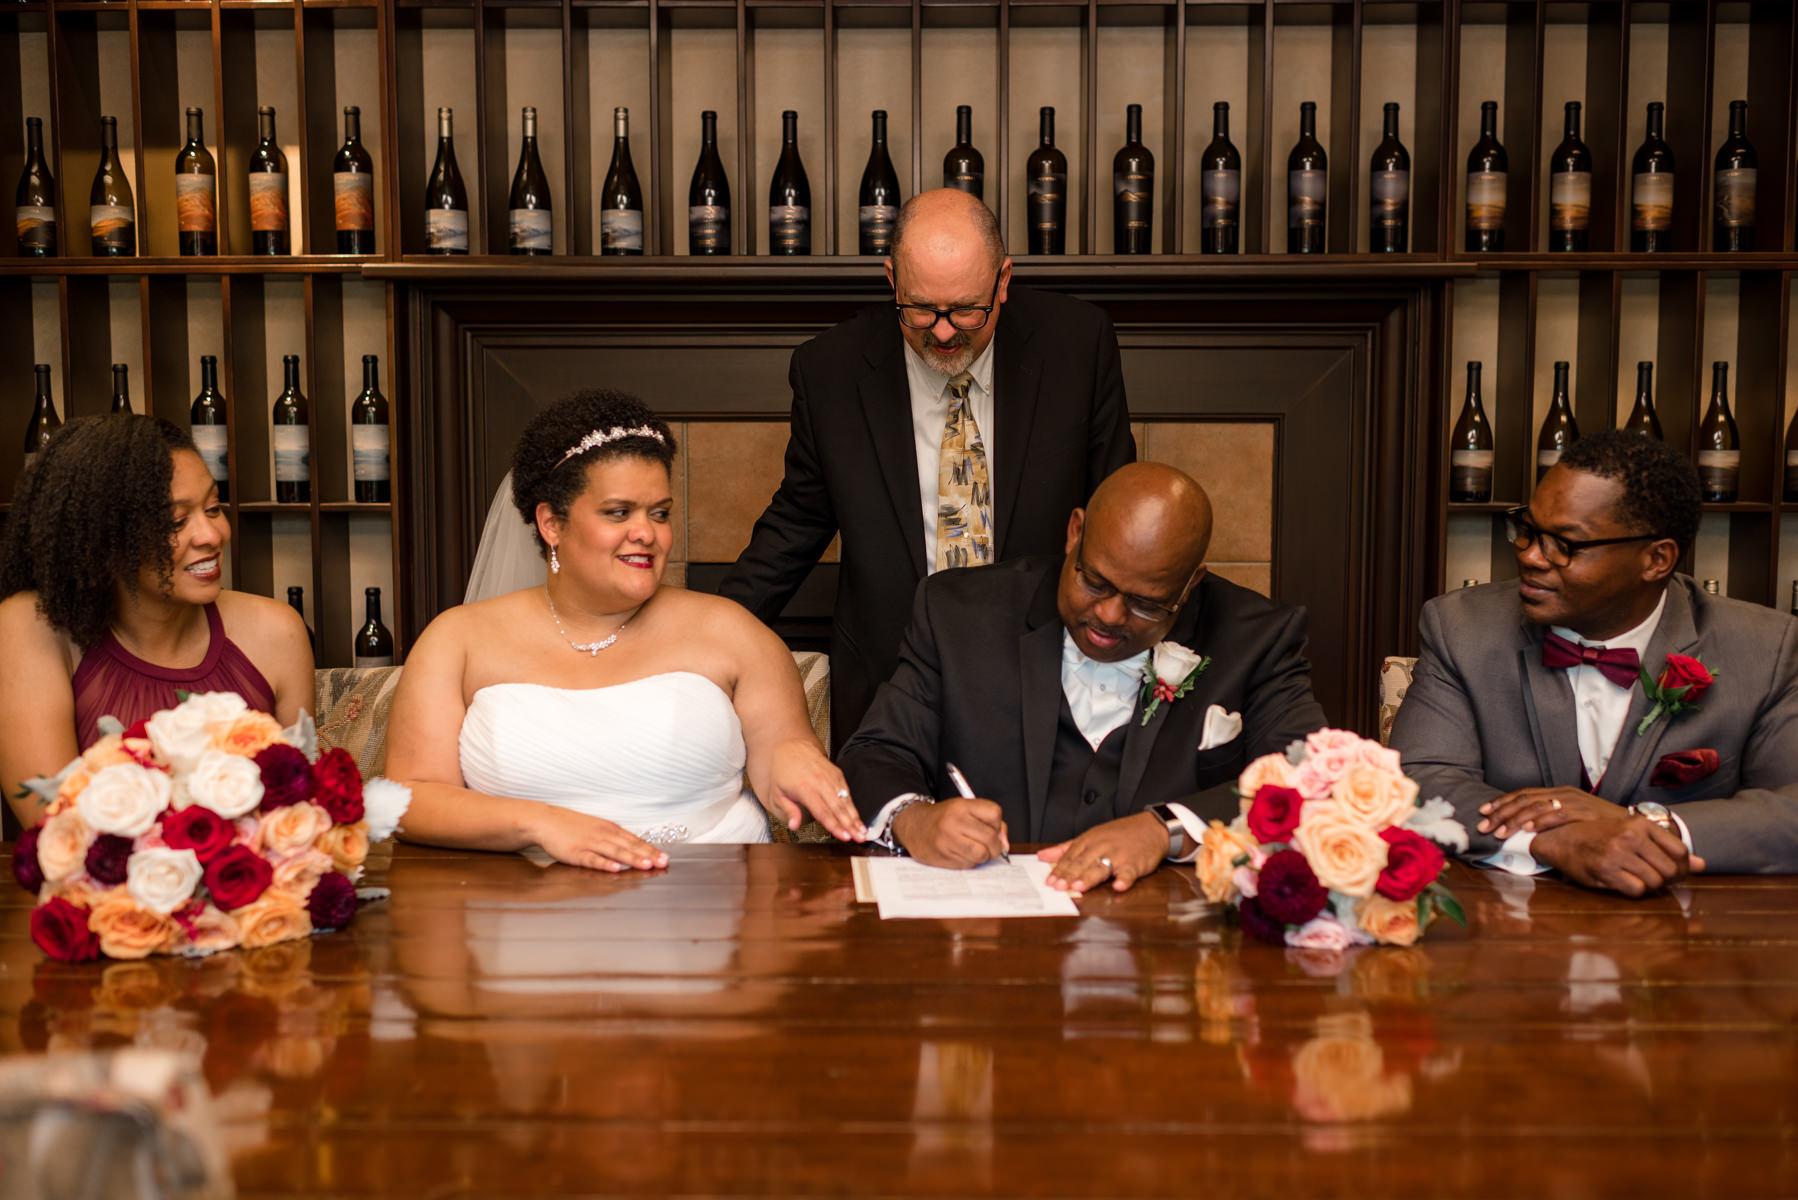 Andrew Tat - Documentary Wedding Photography - Columbia Winery - Woodinville, Washington -Patricia & Teffin - 18.jpg